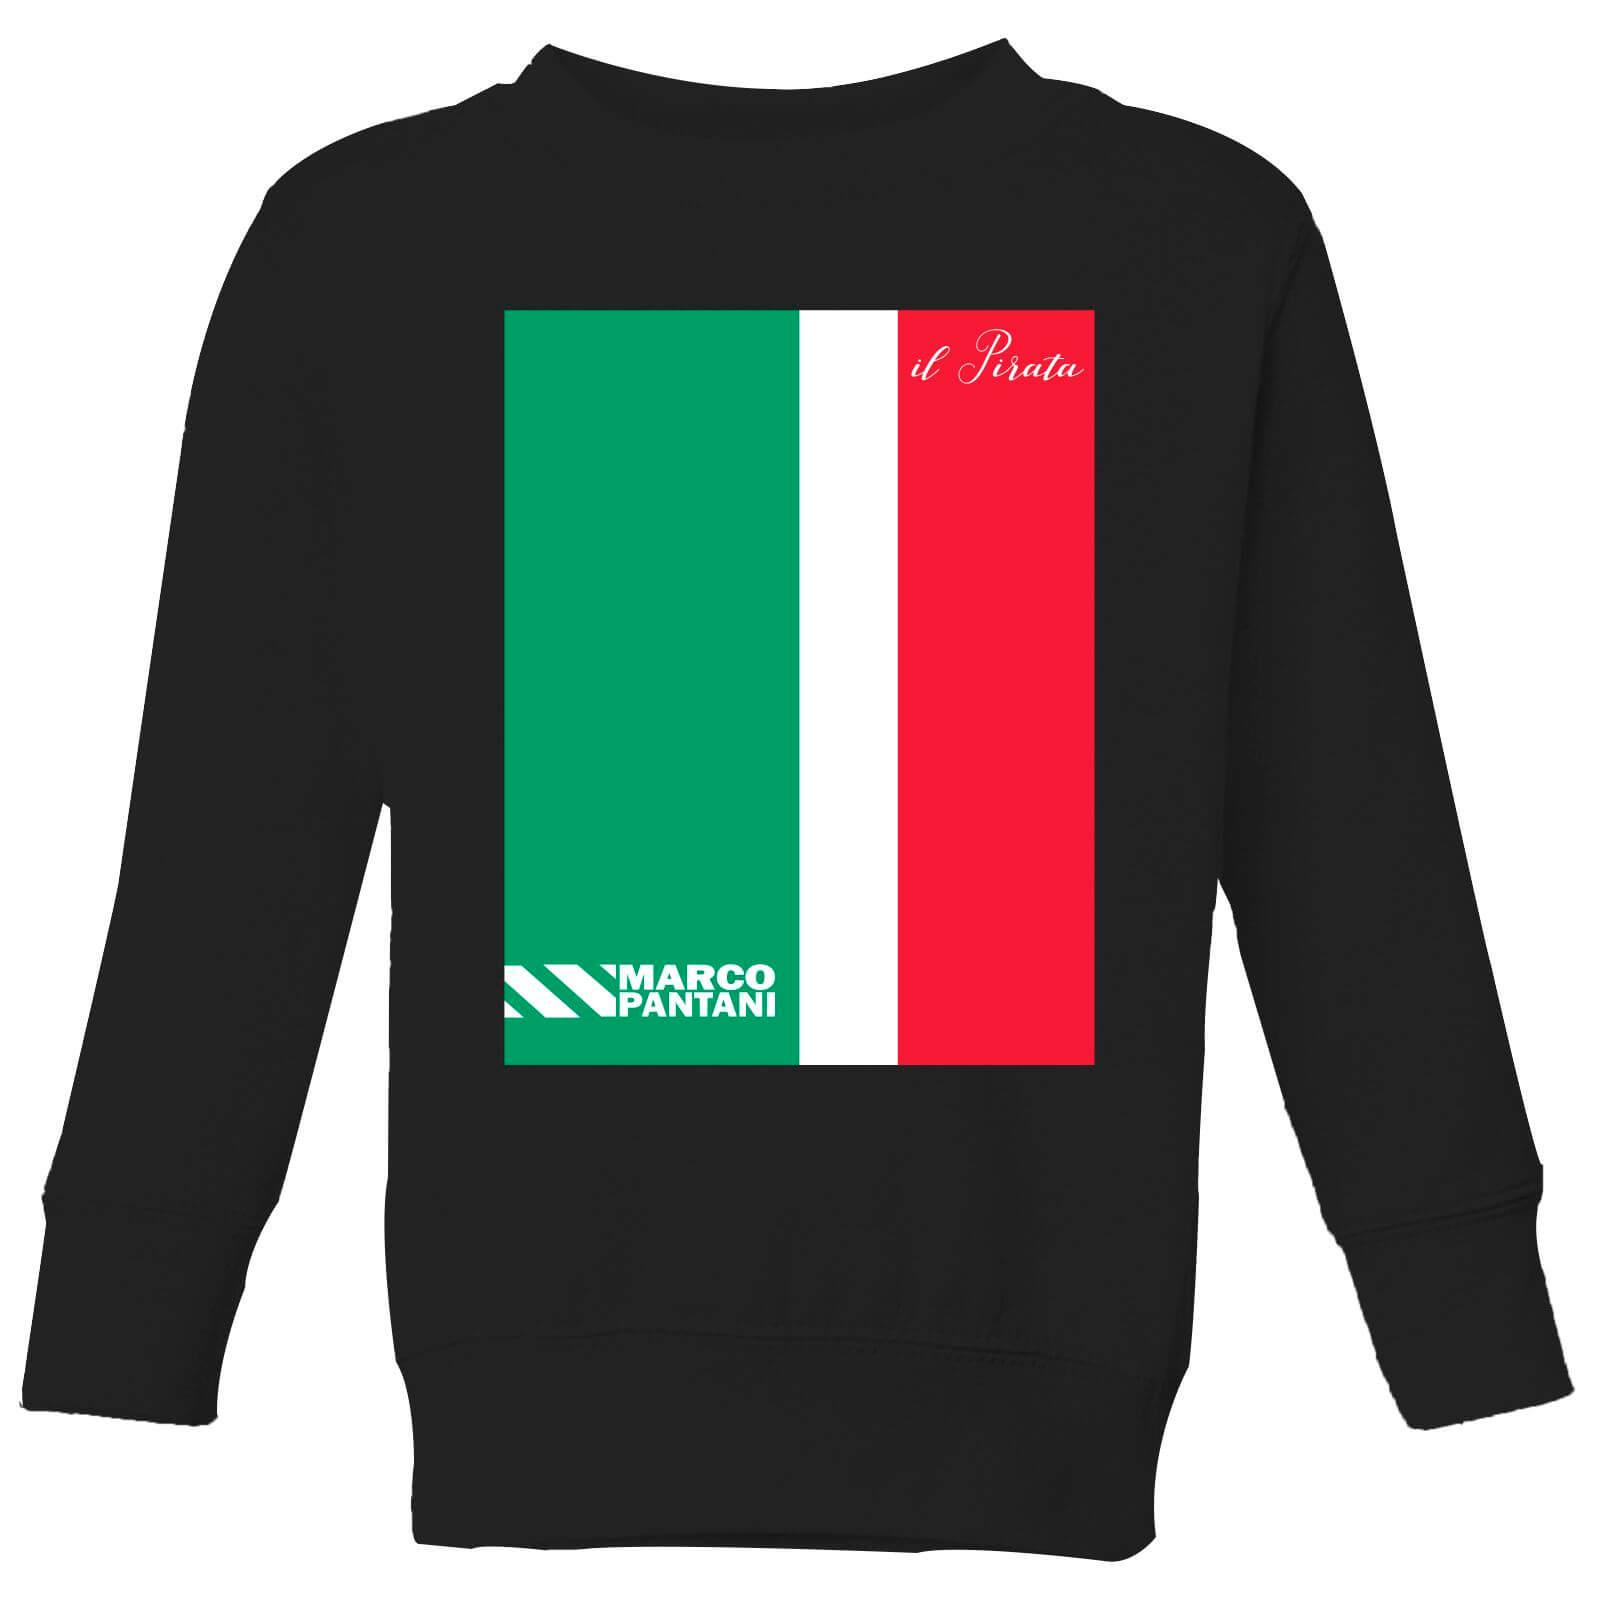 Summit Finish Pantani Il Pirata Kids' Sweatshirt - Black - 5-6 Years - Black